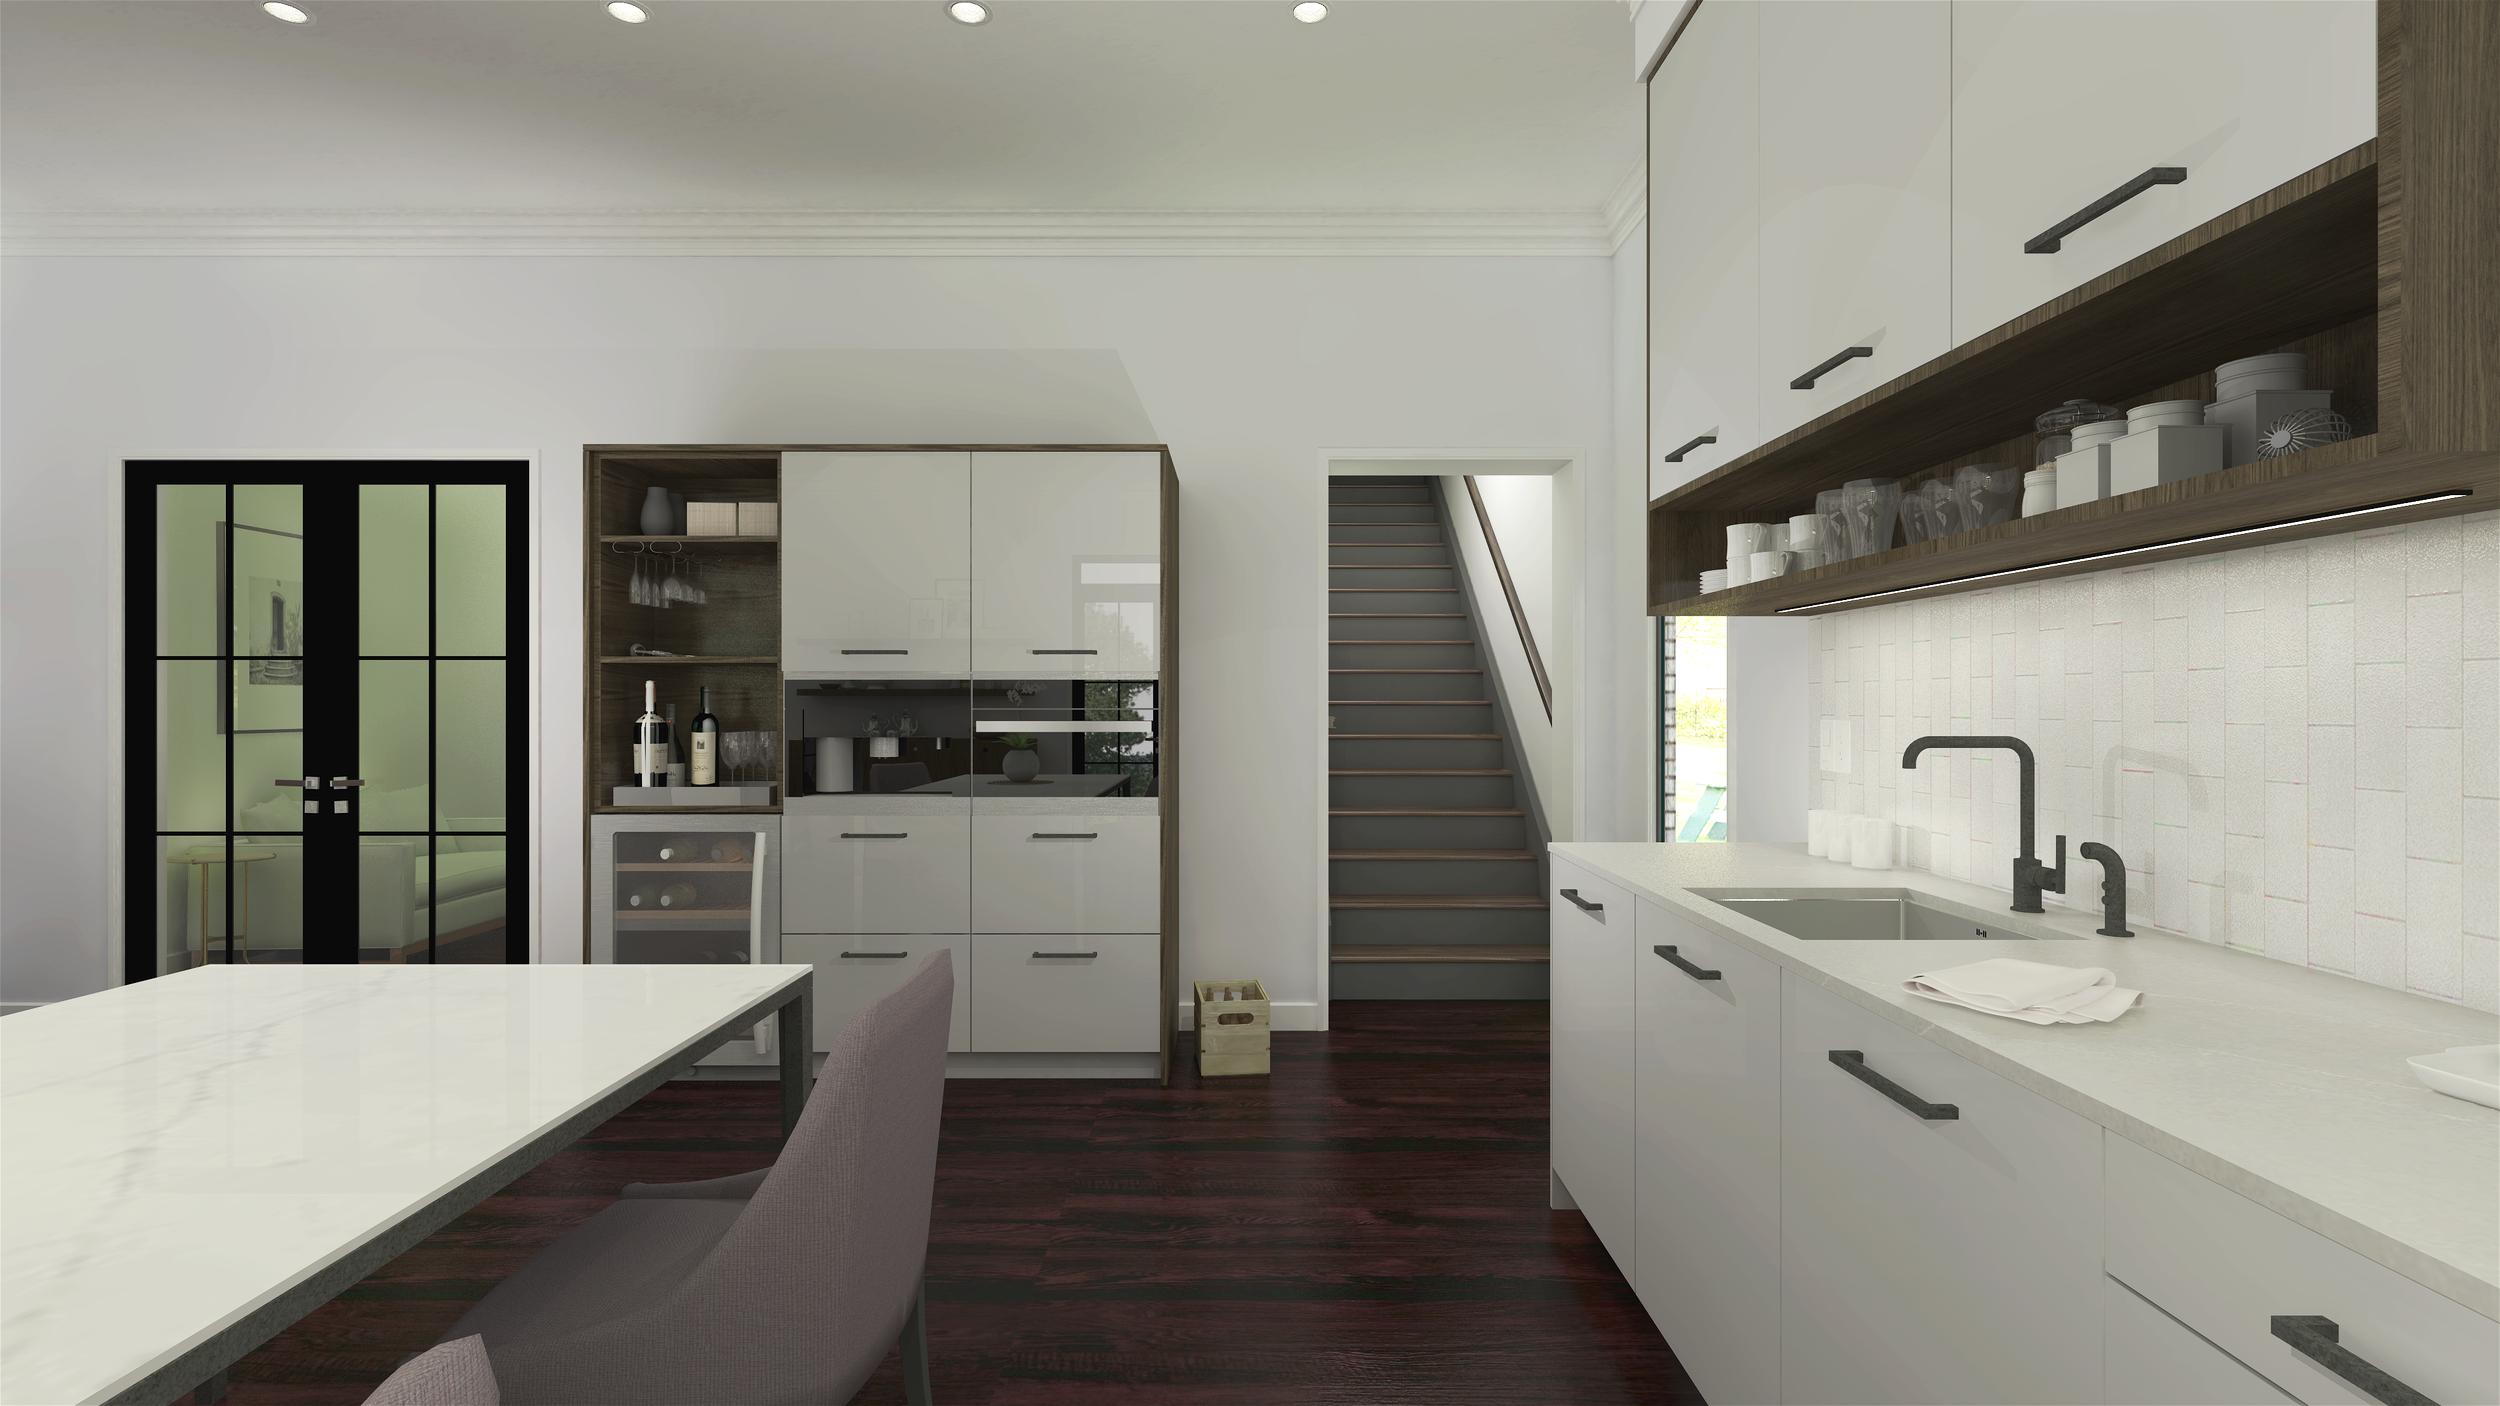 deSousaDESIGN_Kitchen_Metro_House_V1c_3840x2160.png